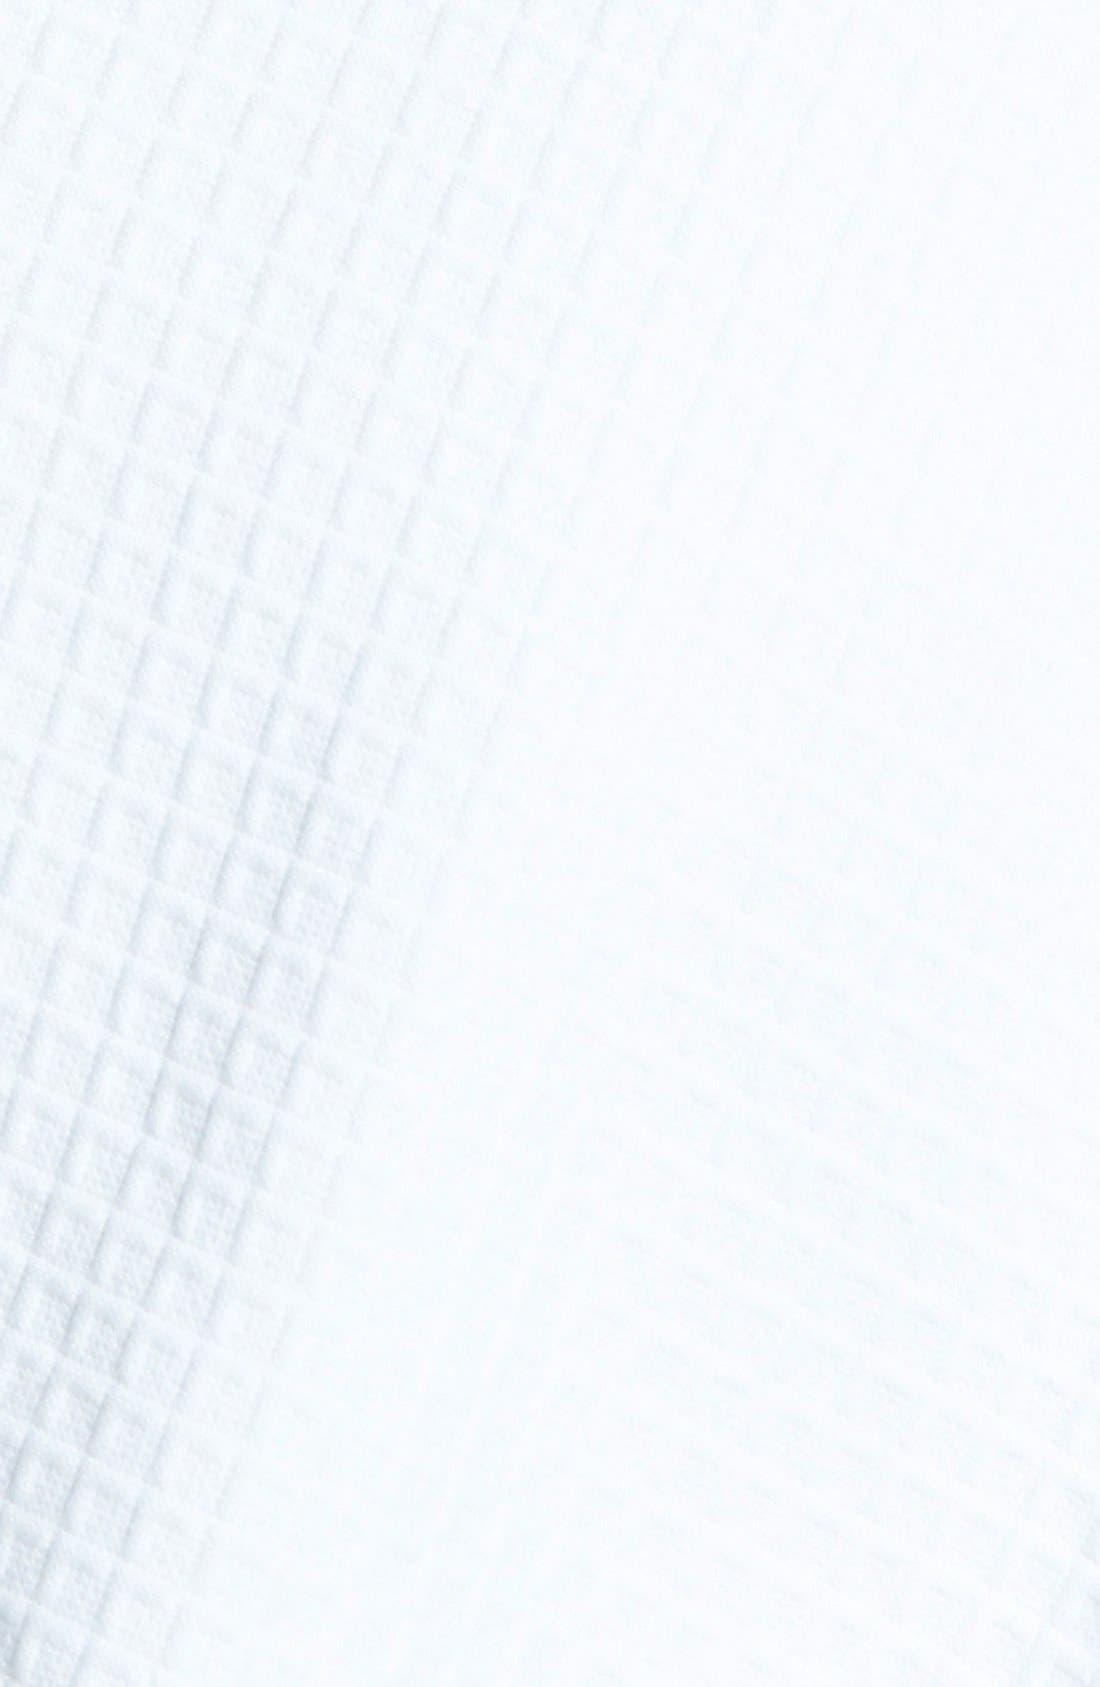 Alternate Image 3  - Rebecca Minkoff 'Perri' Bustier Crop Top